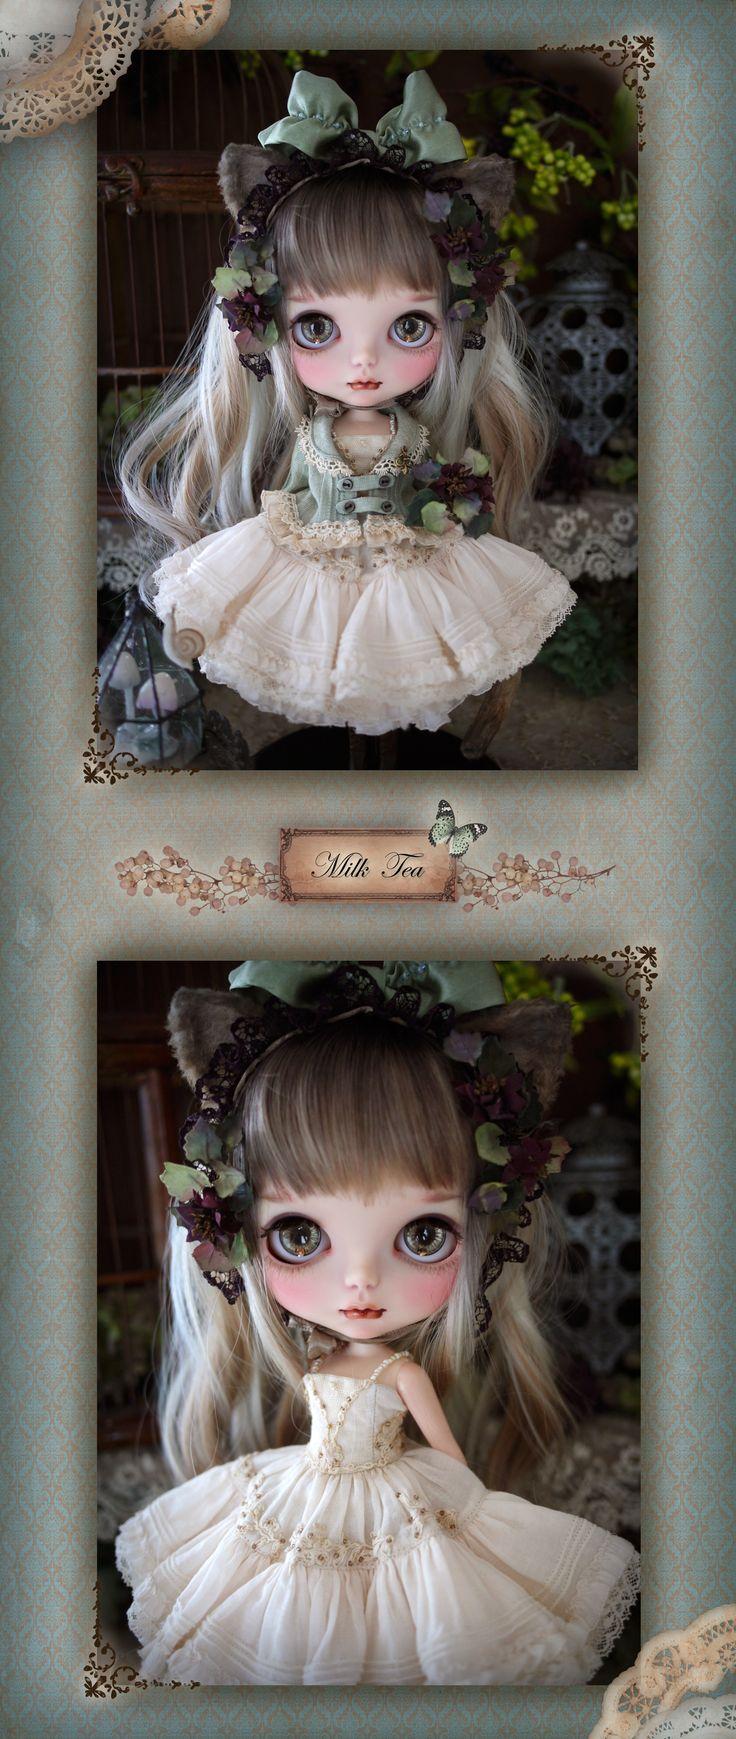 ** Milk Tea ** custom Bryce * .. Siamese of forest .. * Admin - Auction -! Rinkya Japan Auction & Shopping